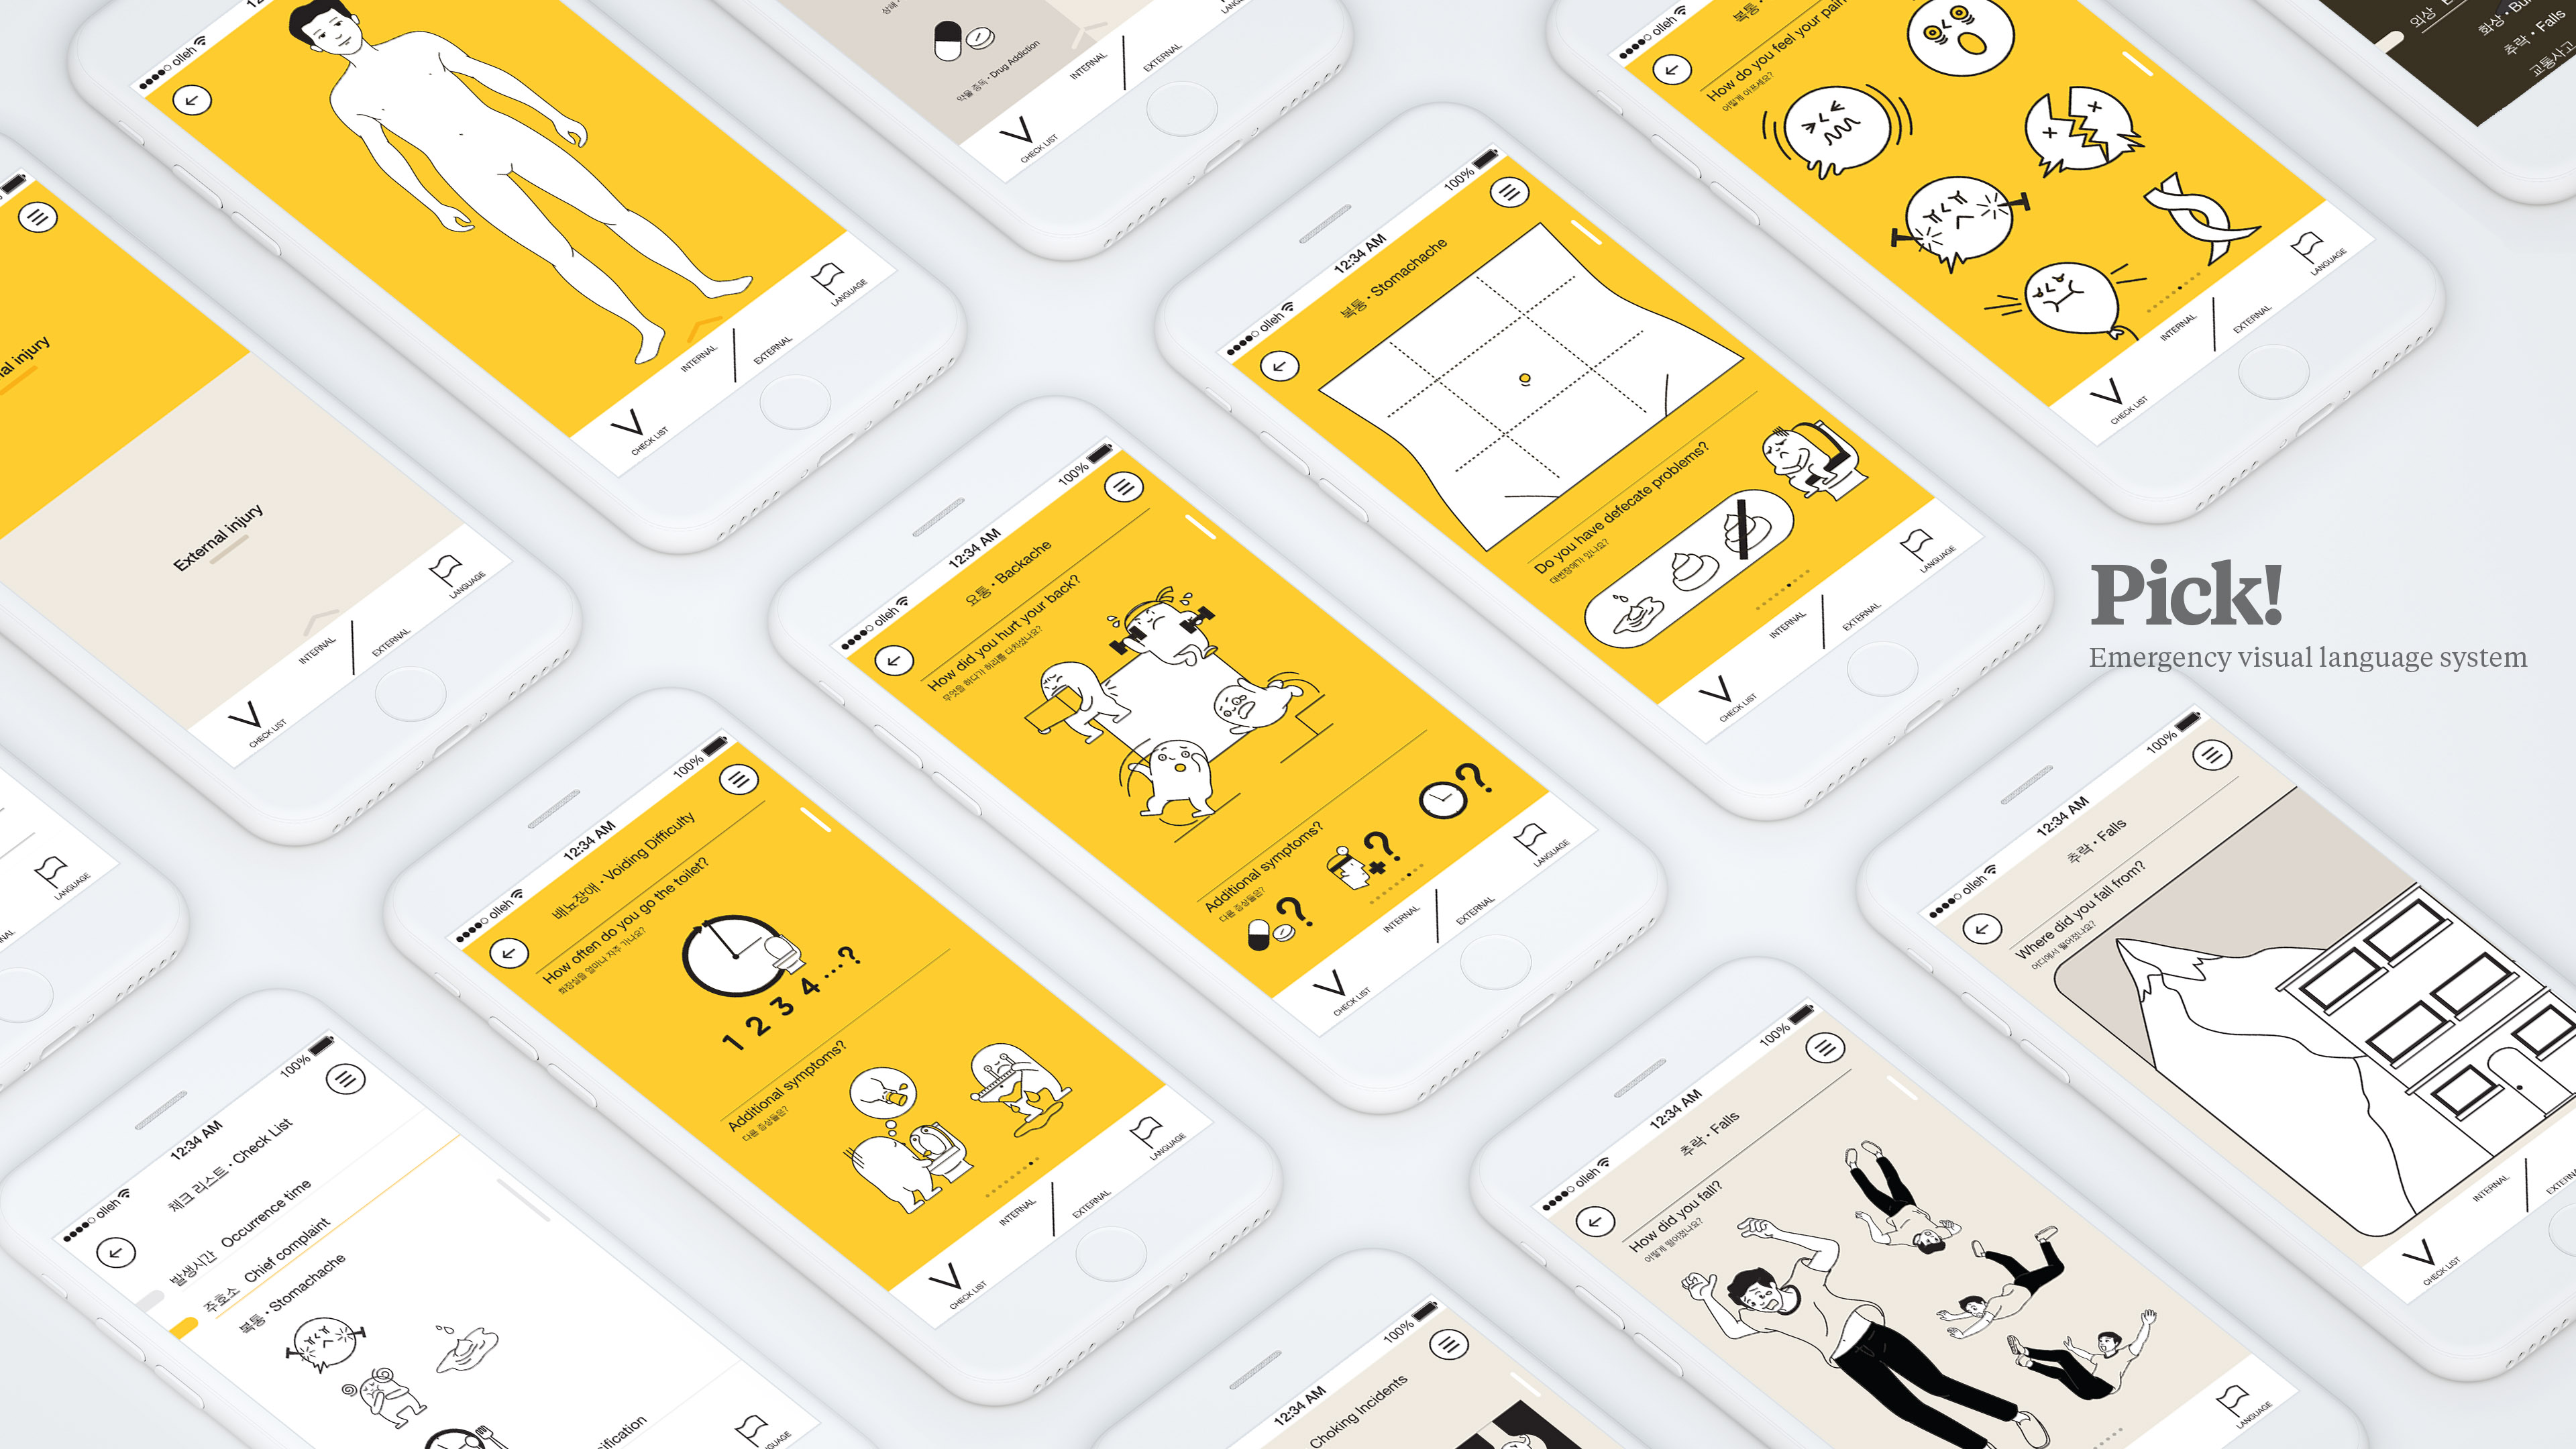 Pick! — Emergency visual language system